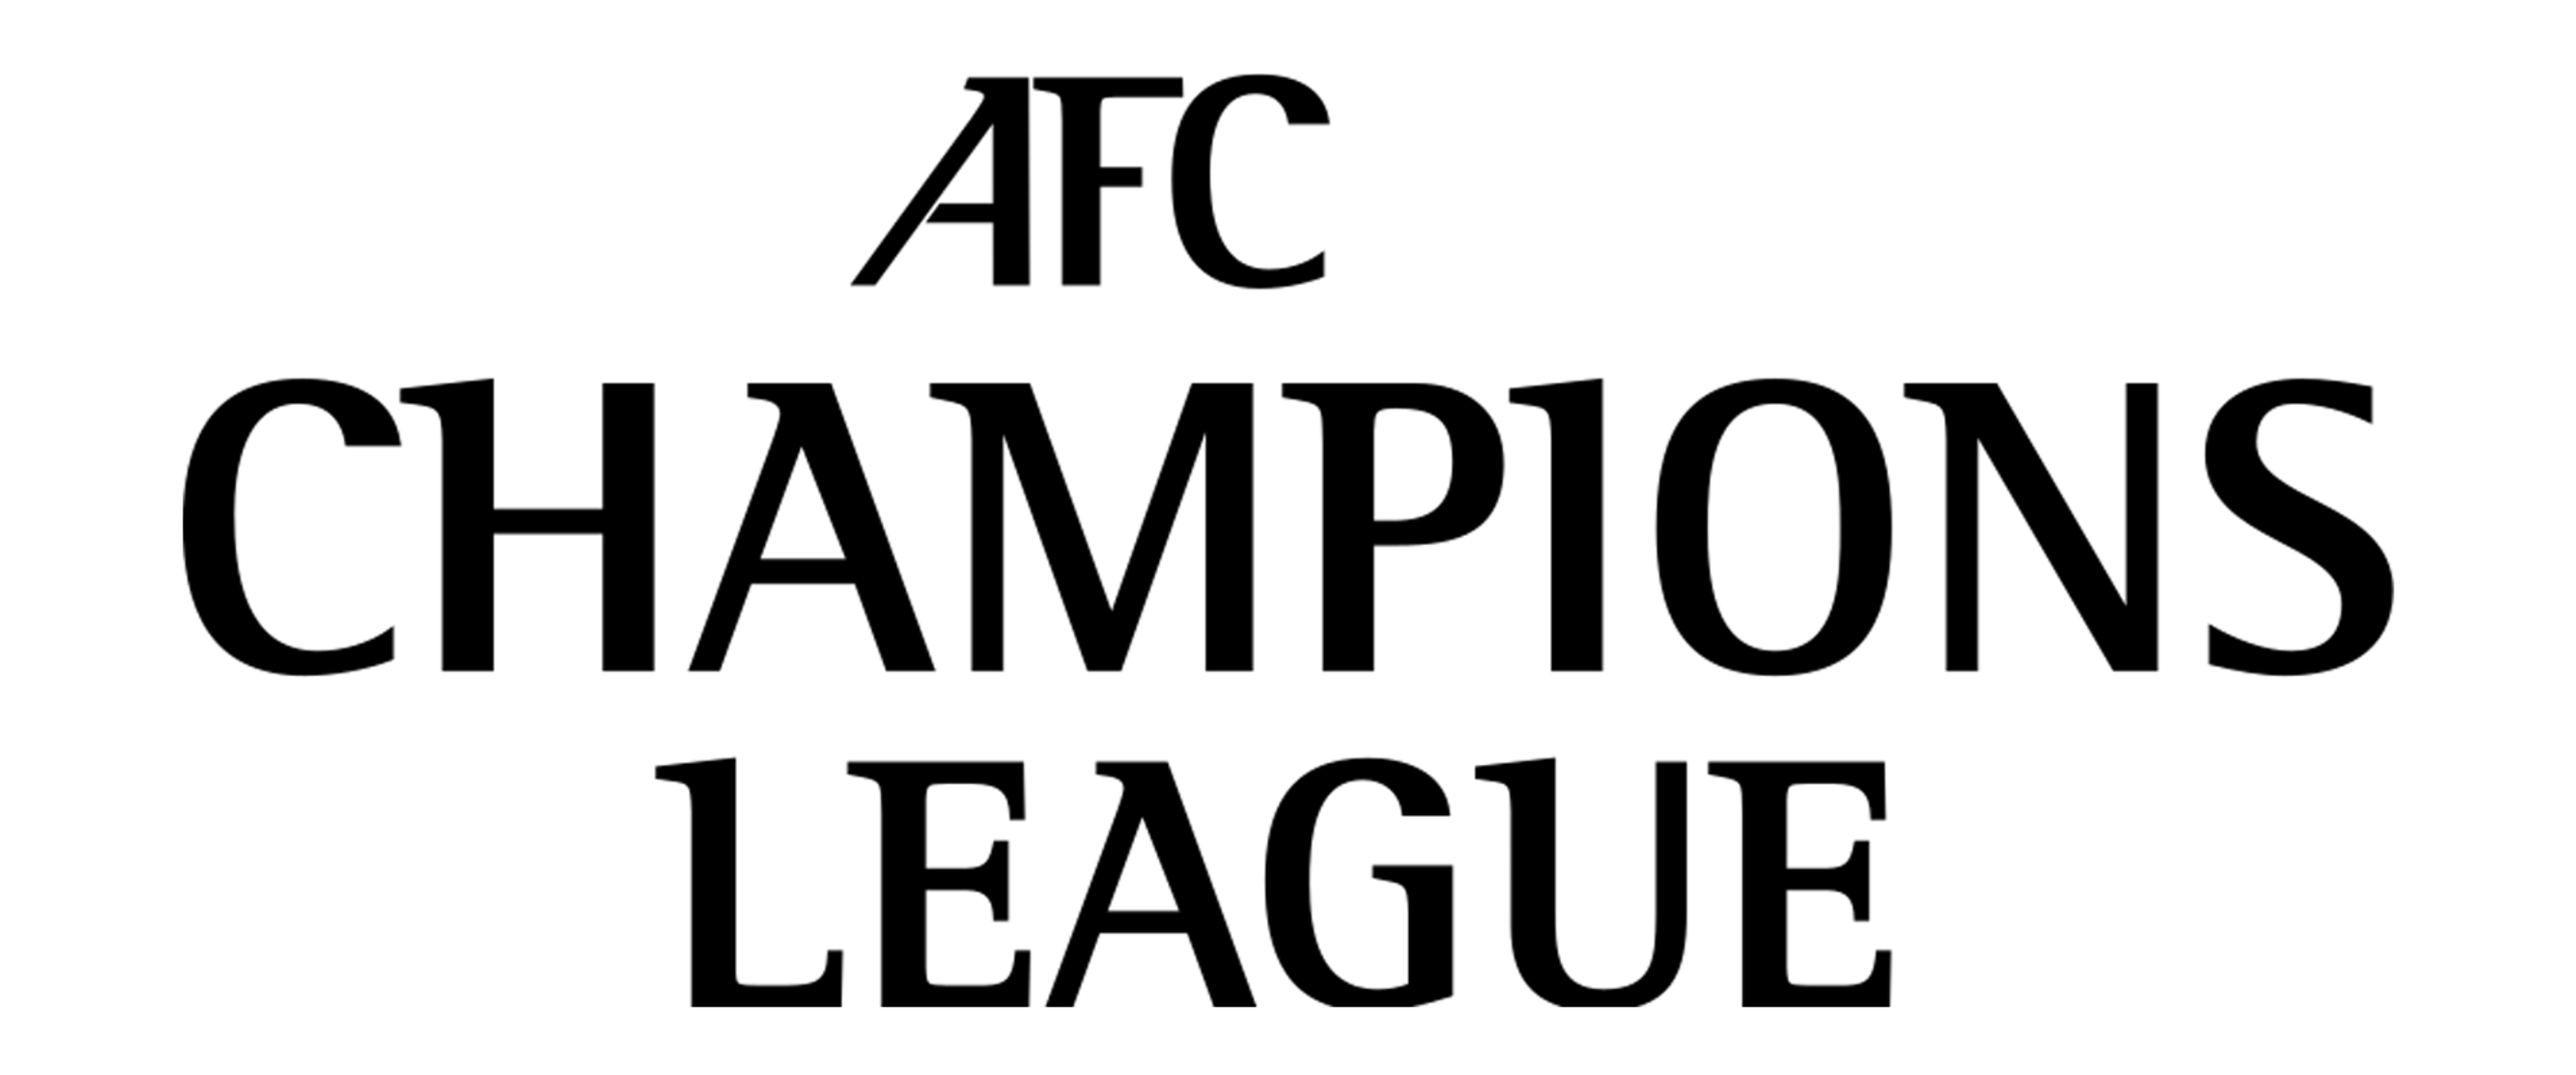 Afc Champions League Logo PNG - 107052